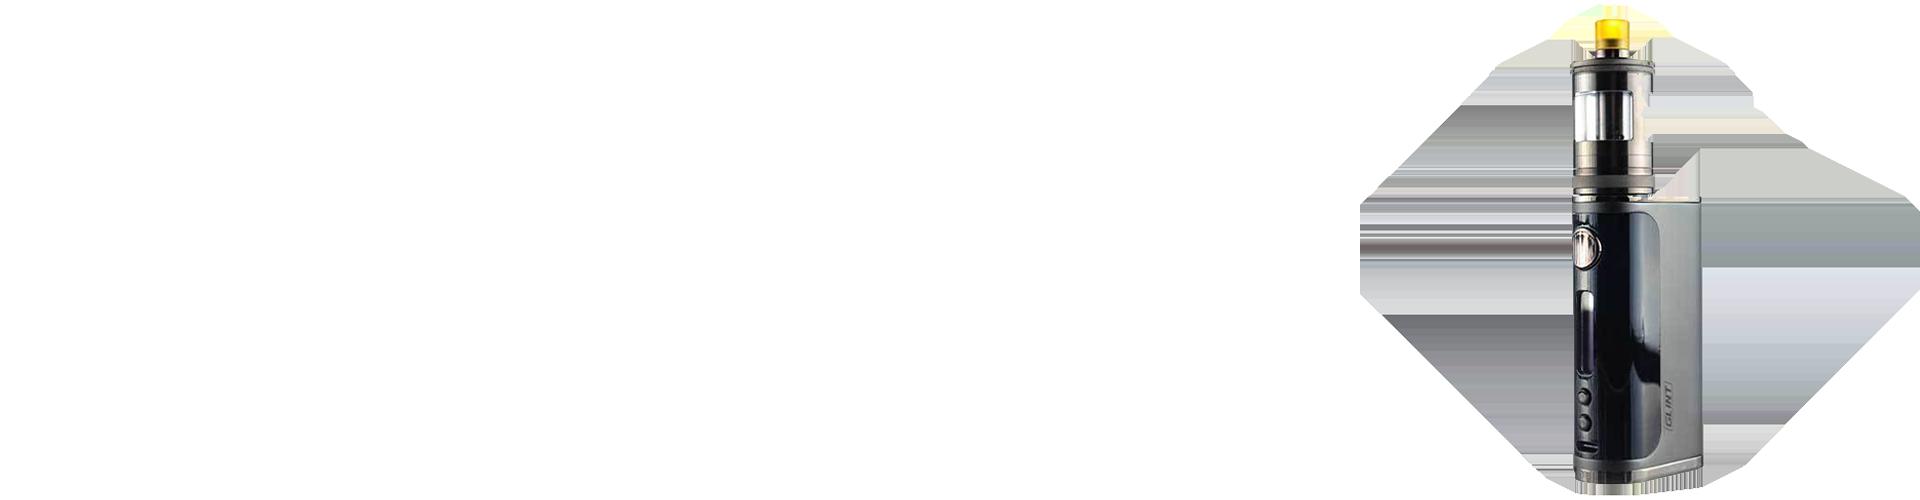 ASPIRE NAUTILUS GT KIT